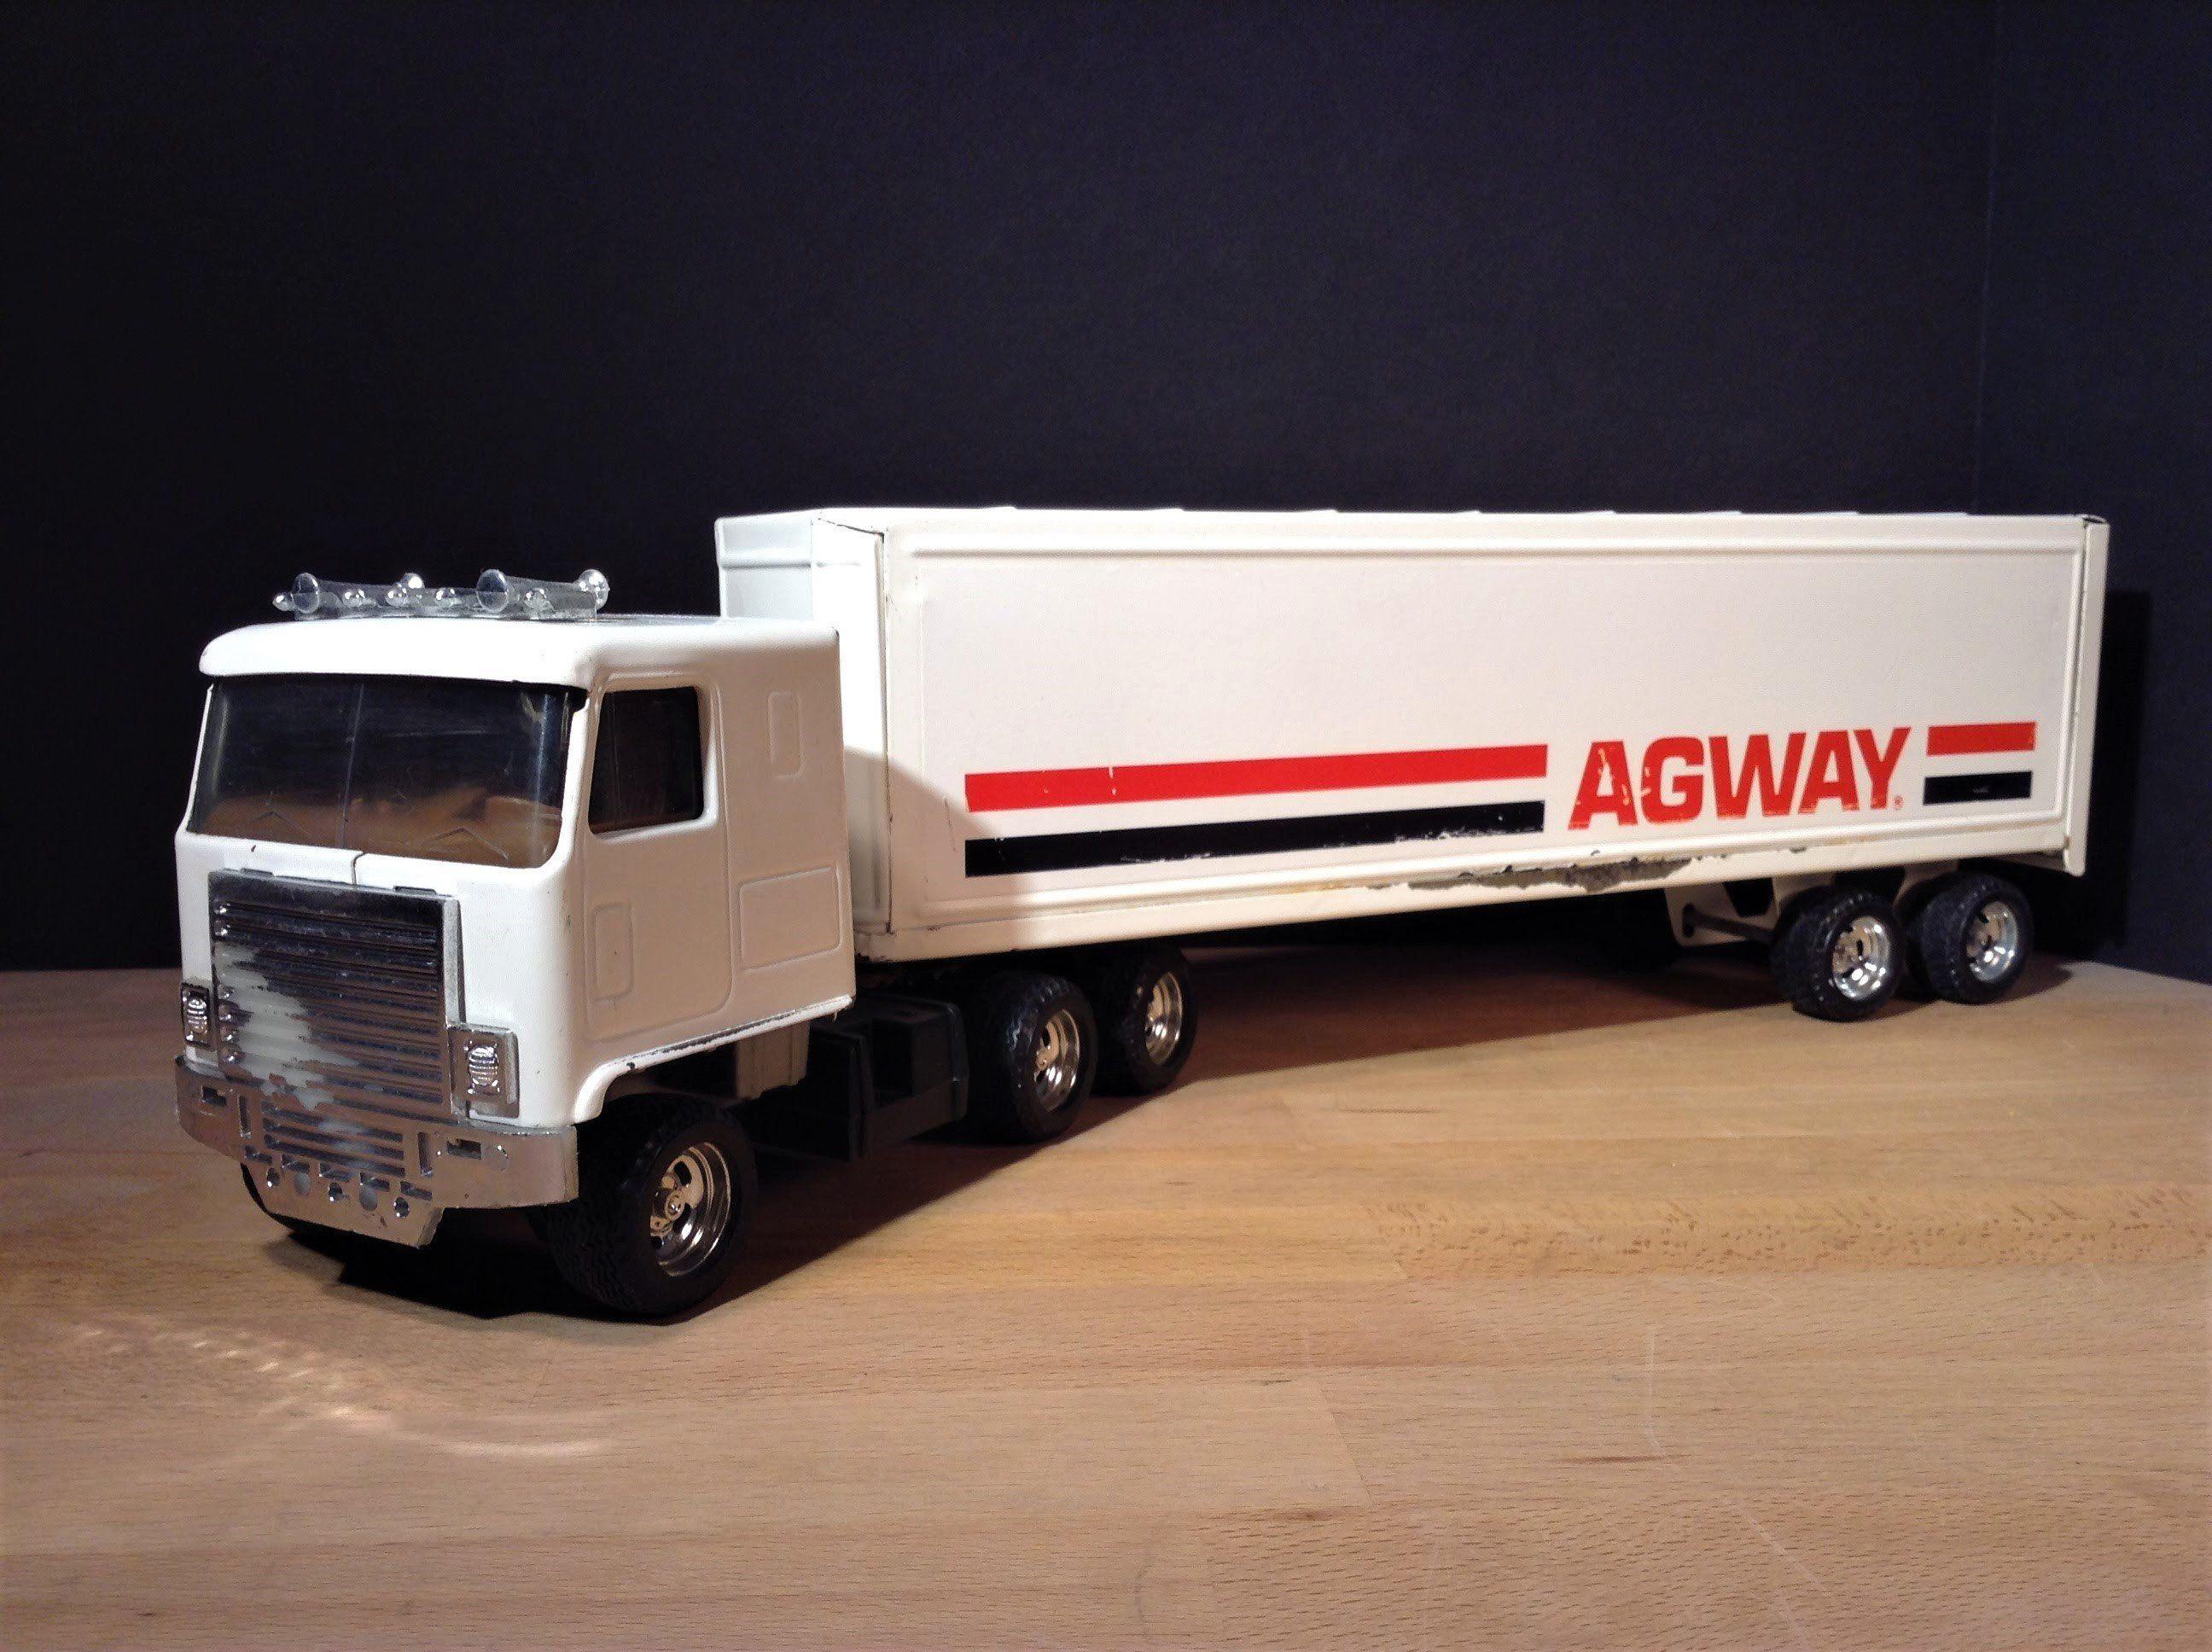 Ertl Truck Ertl Agway Tractor Trailer Vintage Ertl Toy Truck